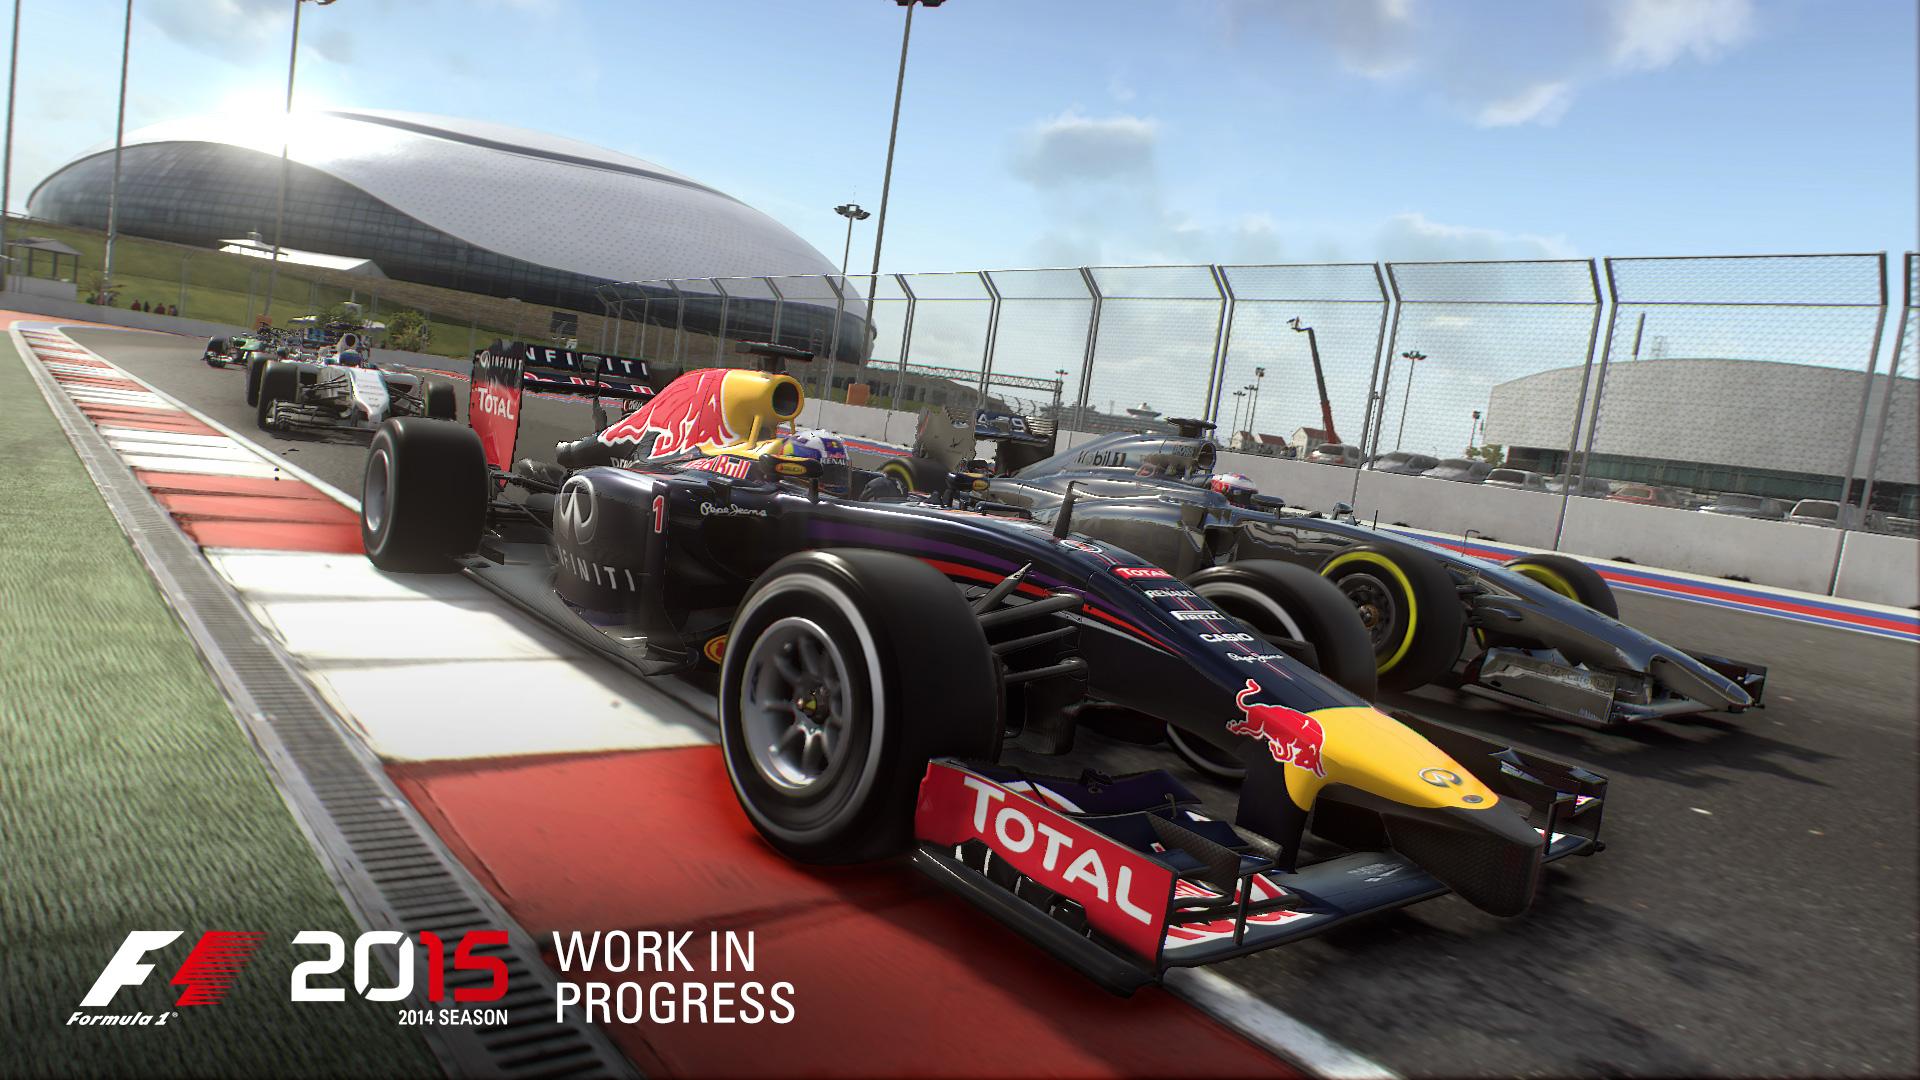 F1 2015 ESPAÑOL PC Full (CPY) + UPDATE v1.0.19.5154 + REPACK 2 DVD5 (JPW) 8